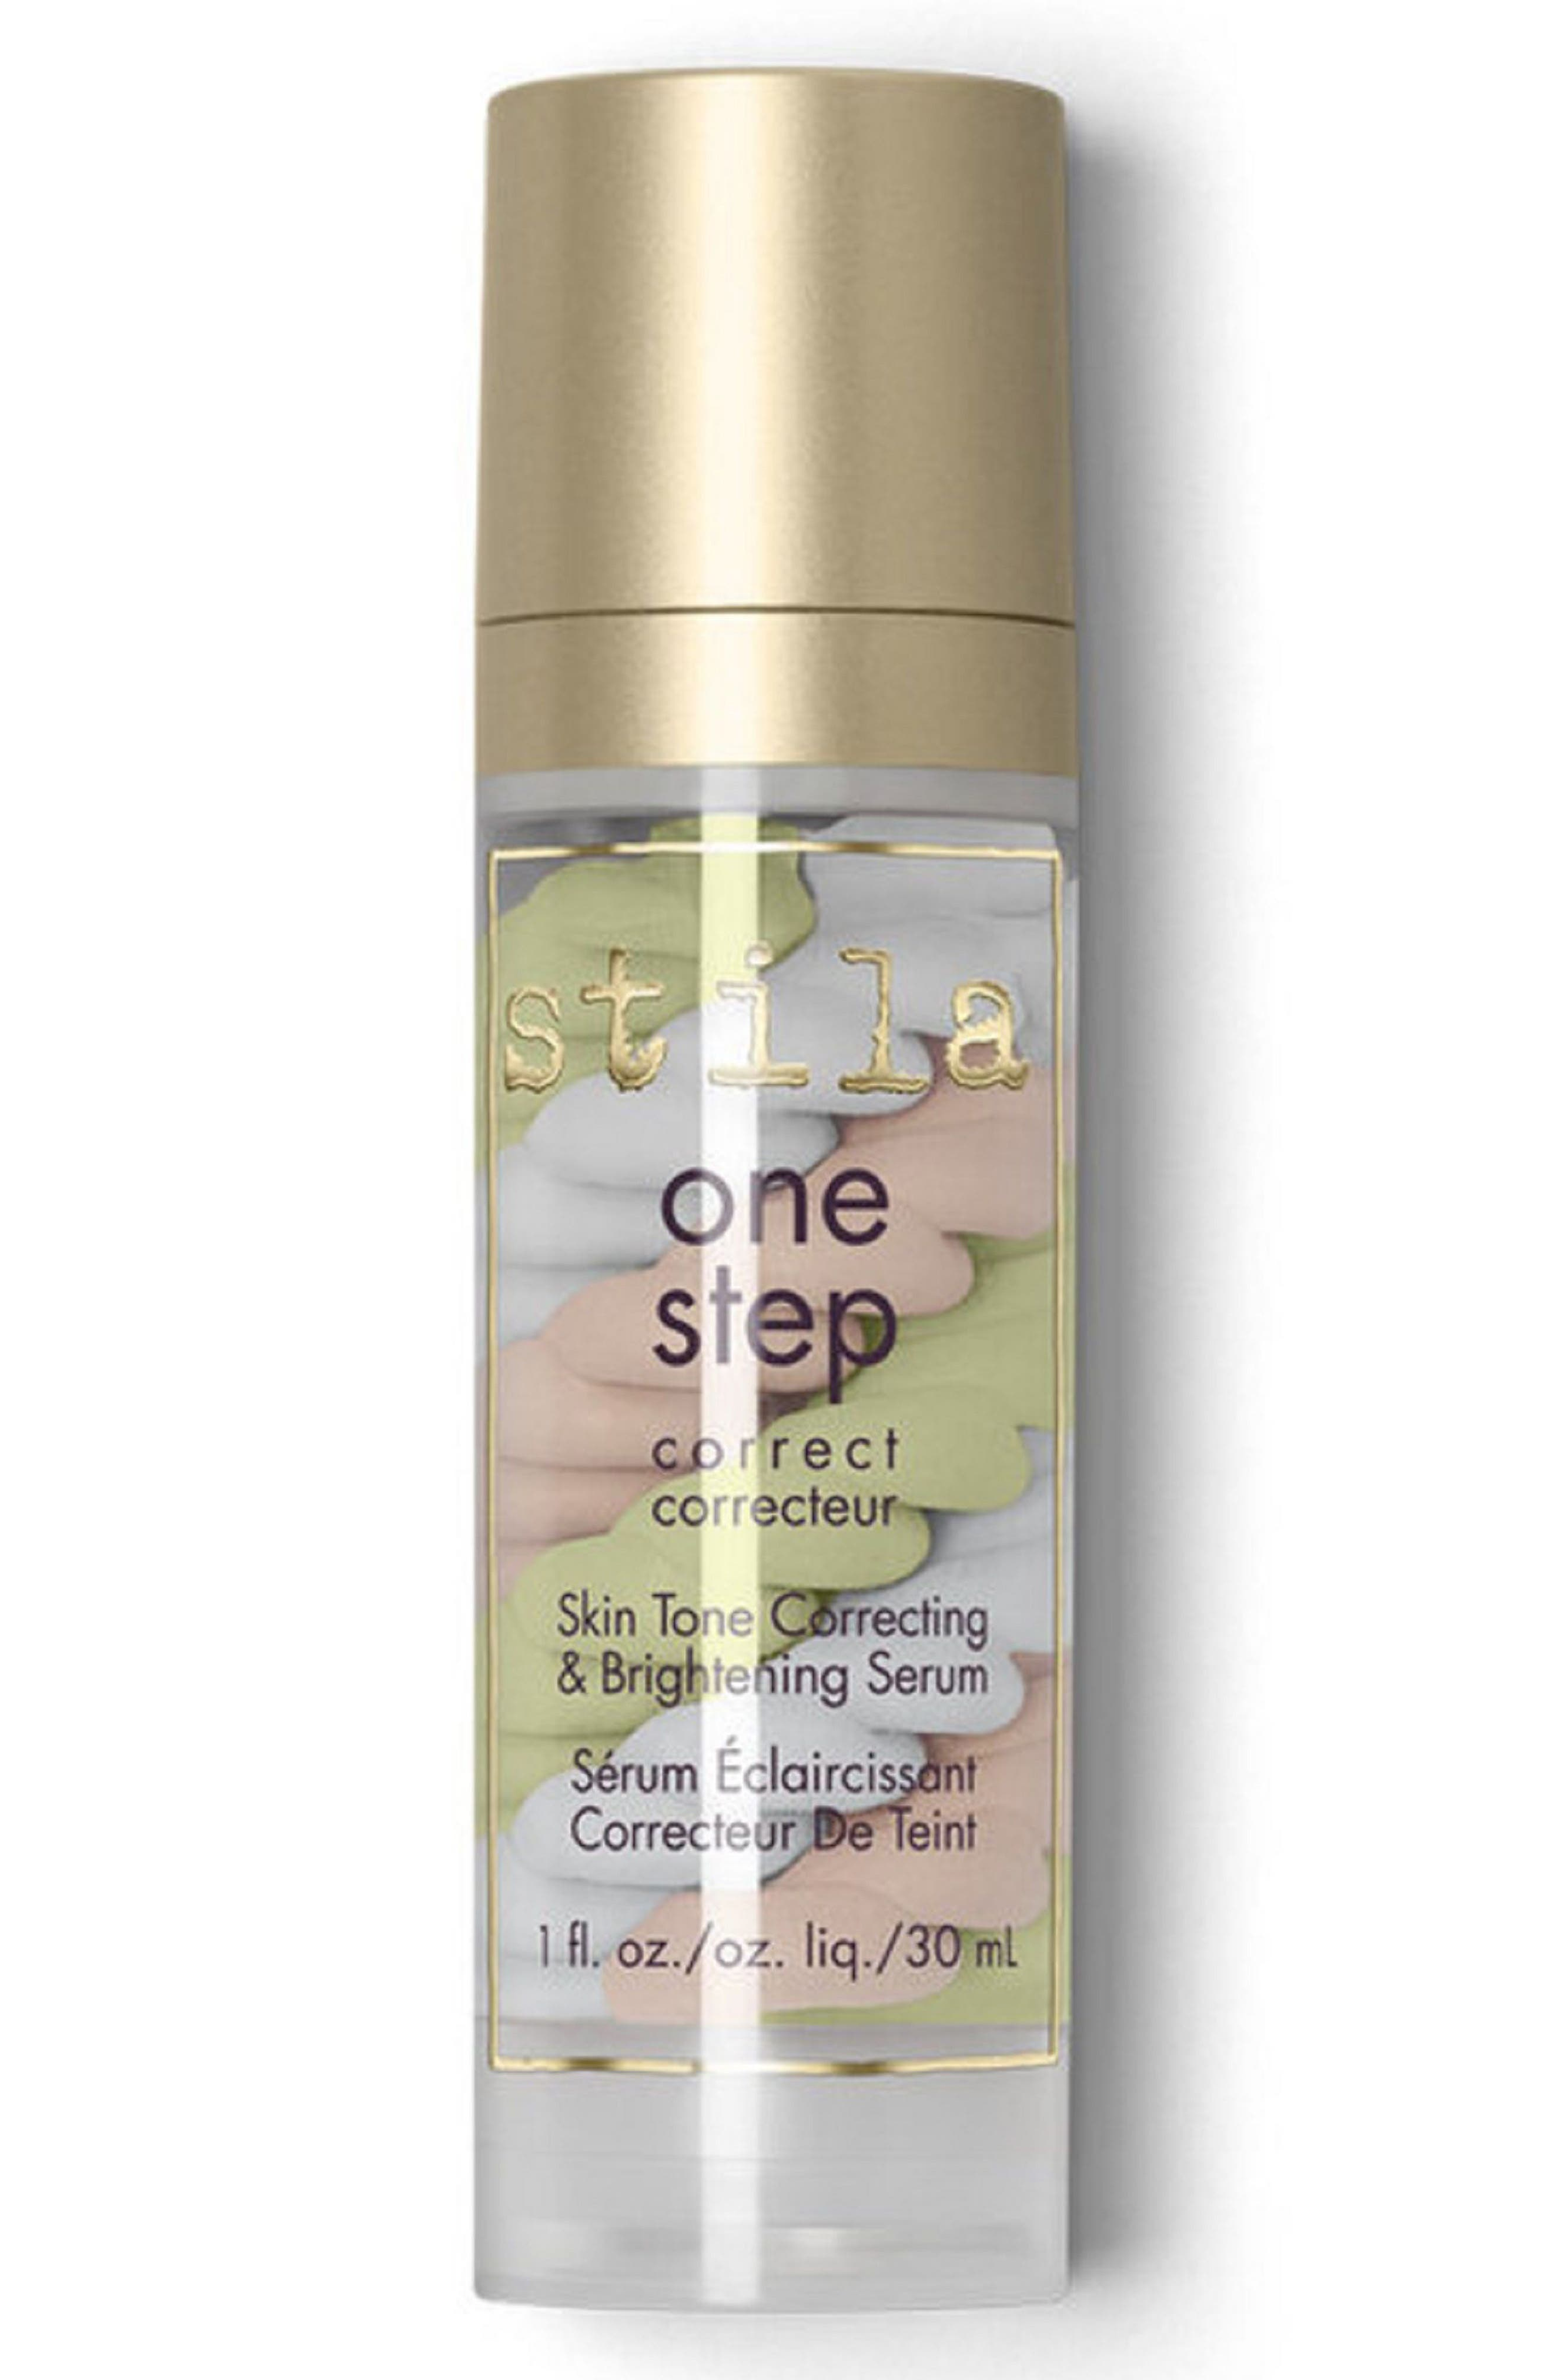 STILA, One Step Correct Skin Tone Correcting Brightening Serum, Main thumbnail 1, color, NO COLOR